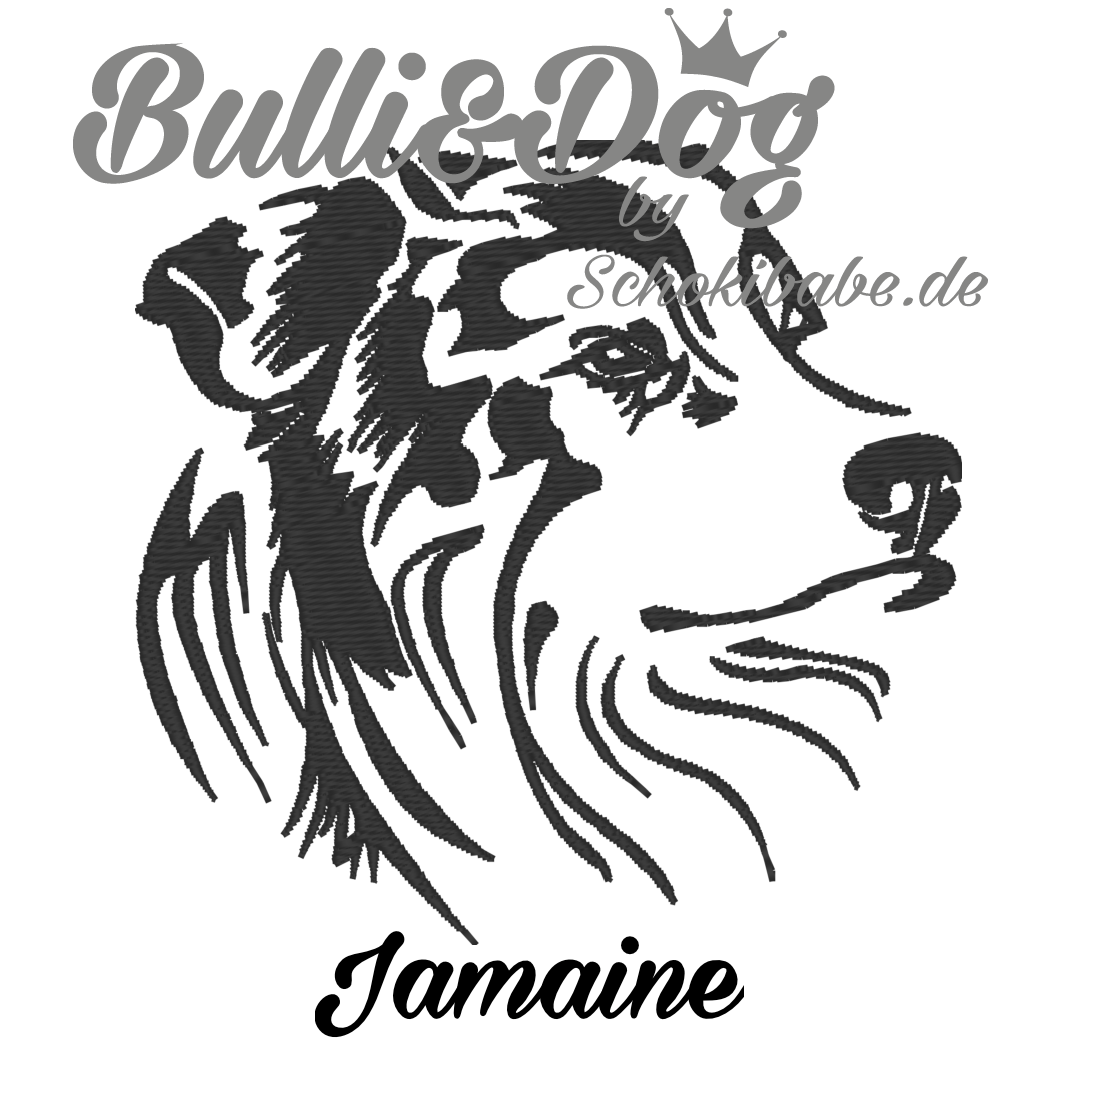 Jamaine_7x6-8-Kopie5b5c22da4e7e8